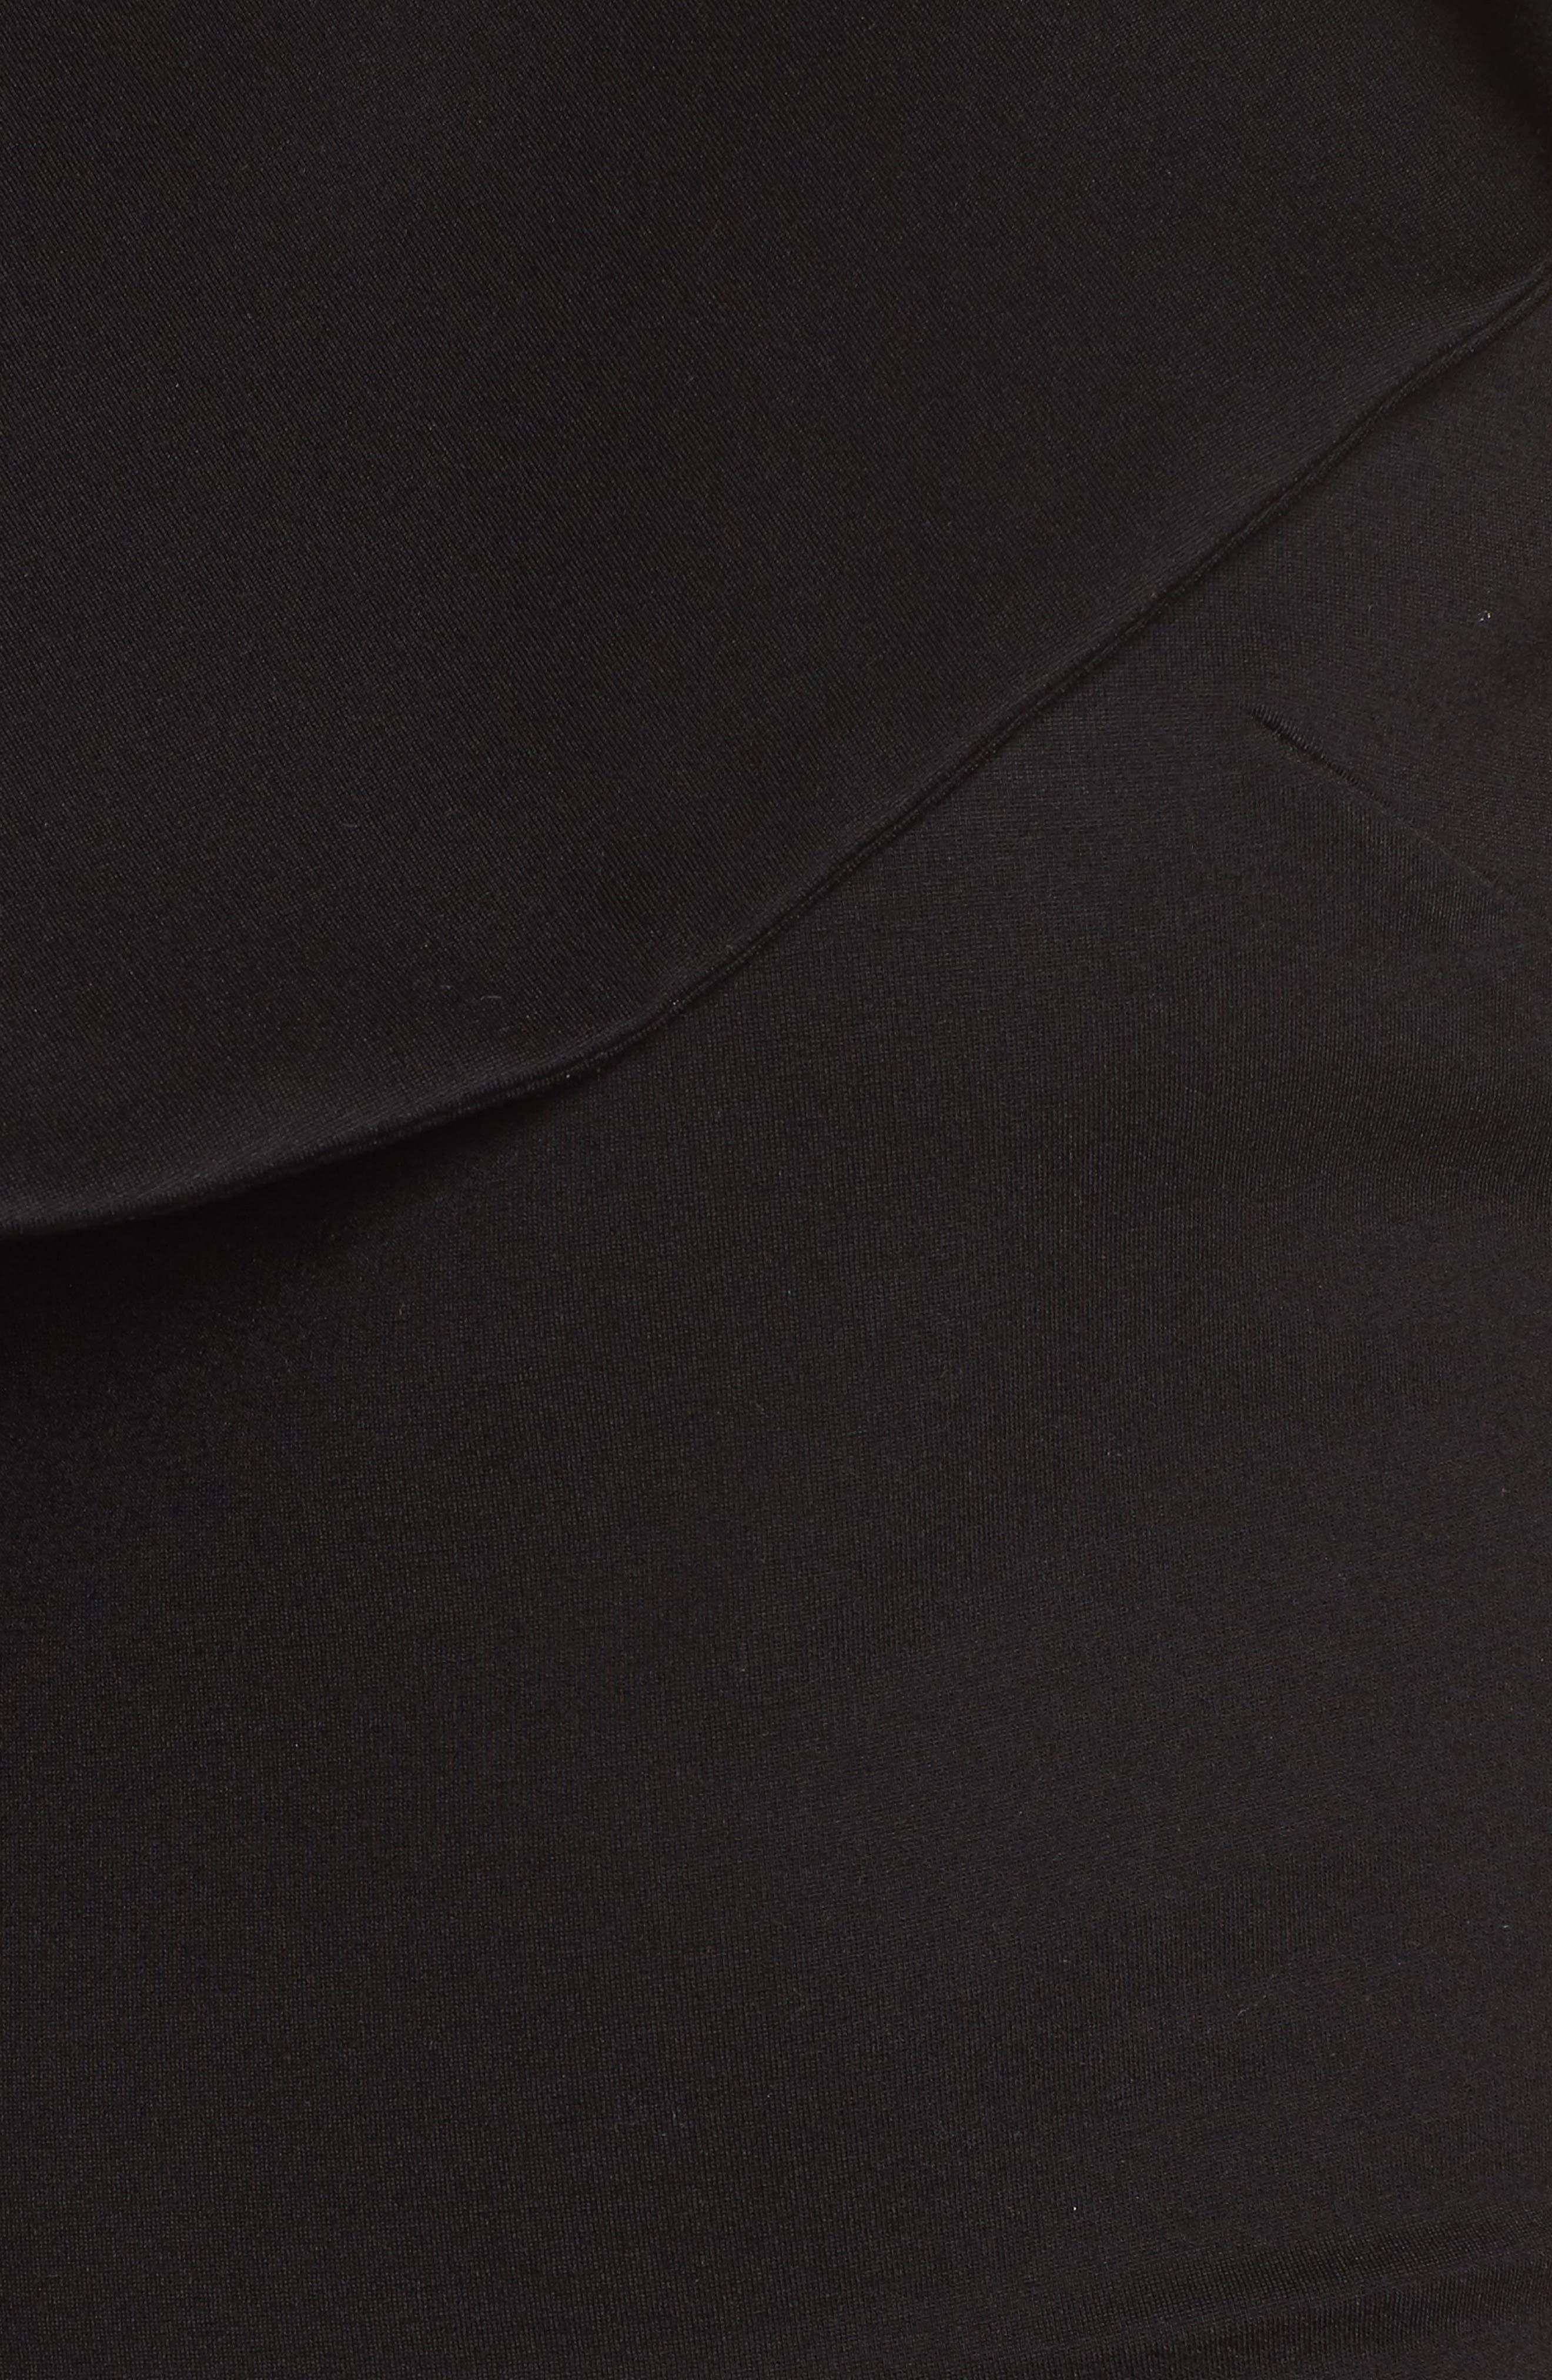 Revel One-Shoulder Top,                             Alternate thumbnail 5, color,                             001